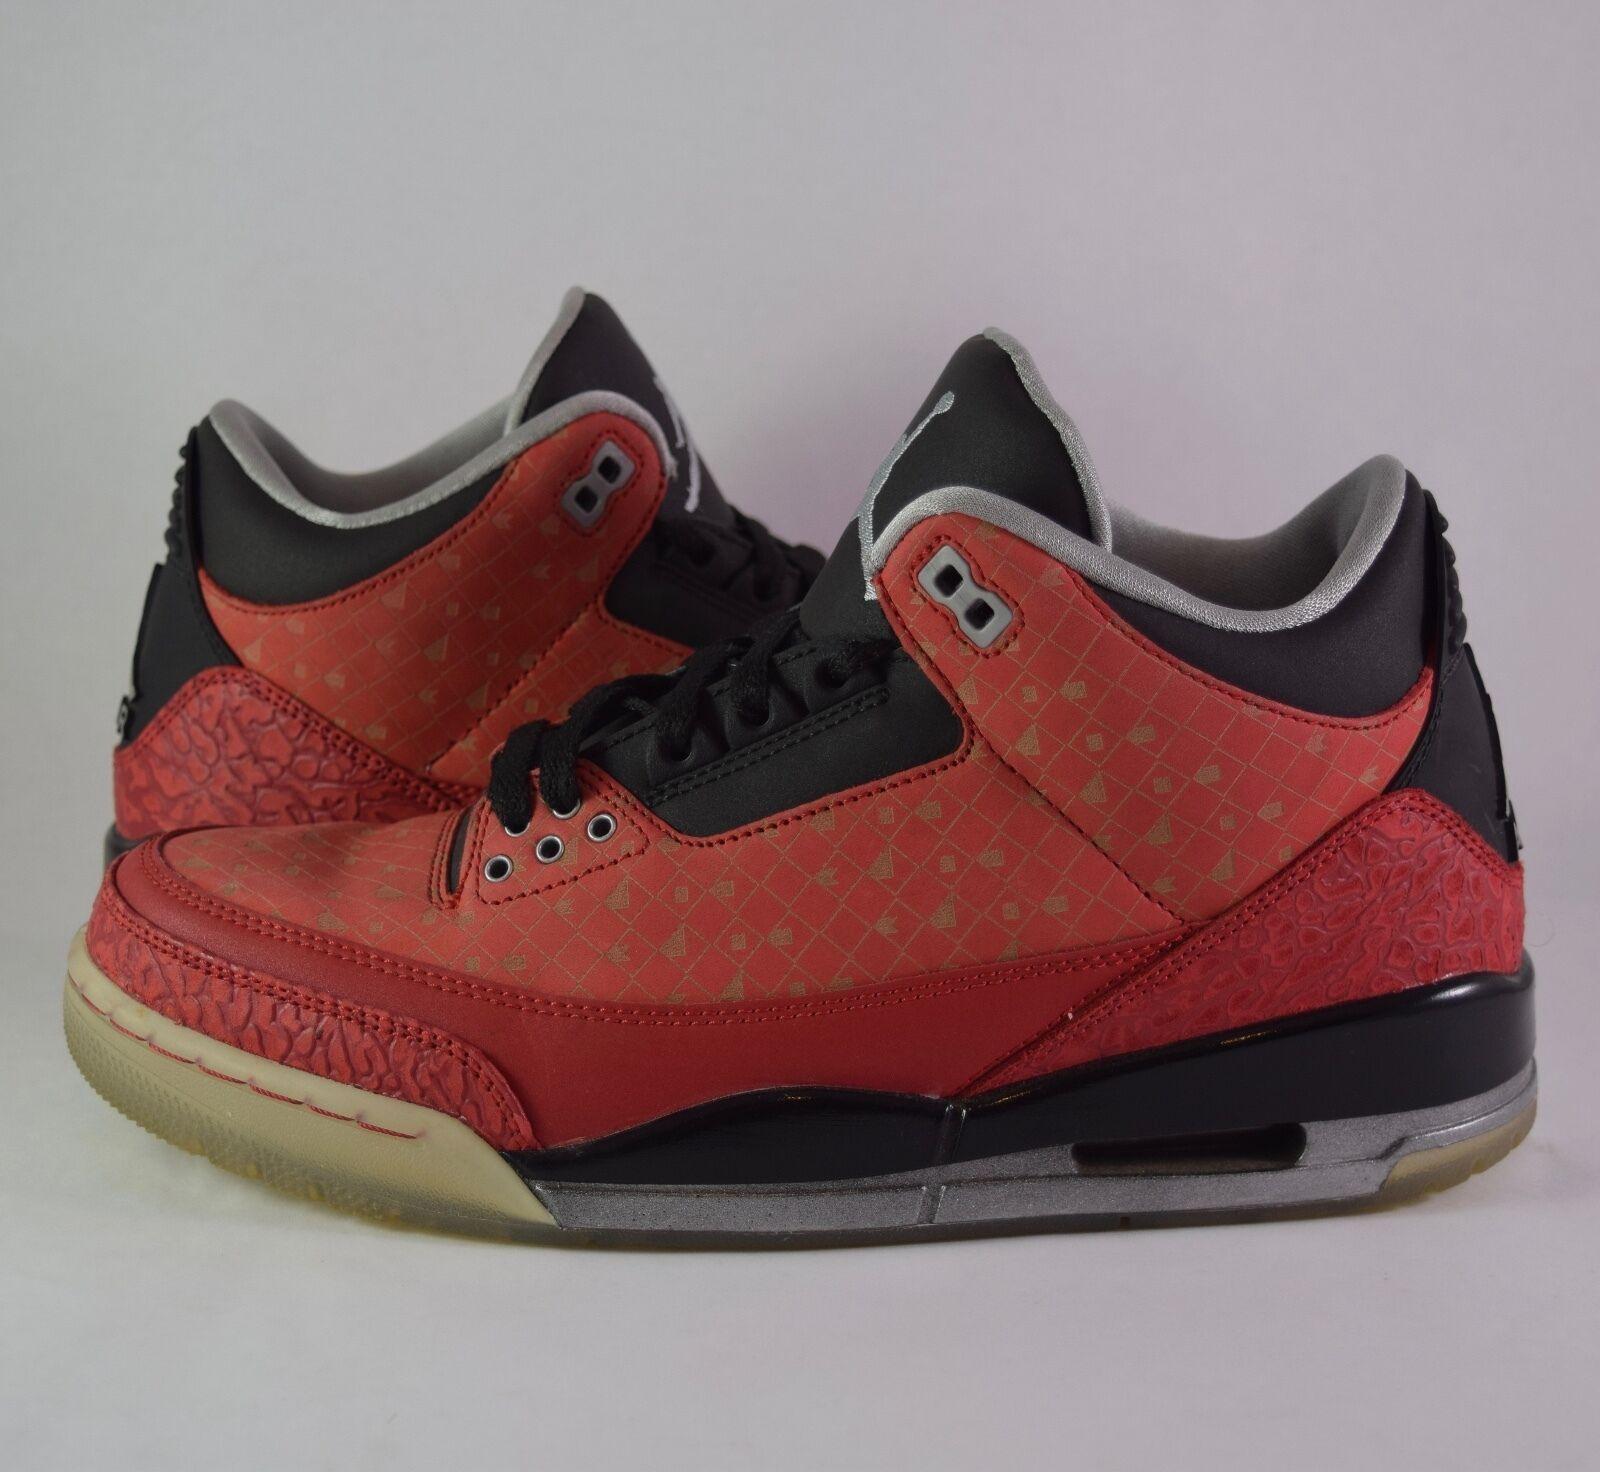 b26984545 Air Jordan 3 Retro Doernbecher 2013 8.5 Size npbkcw6145-Athletic ...